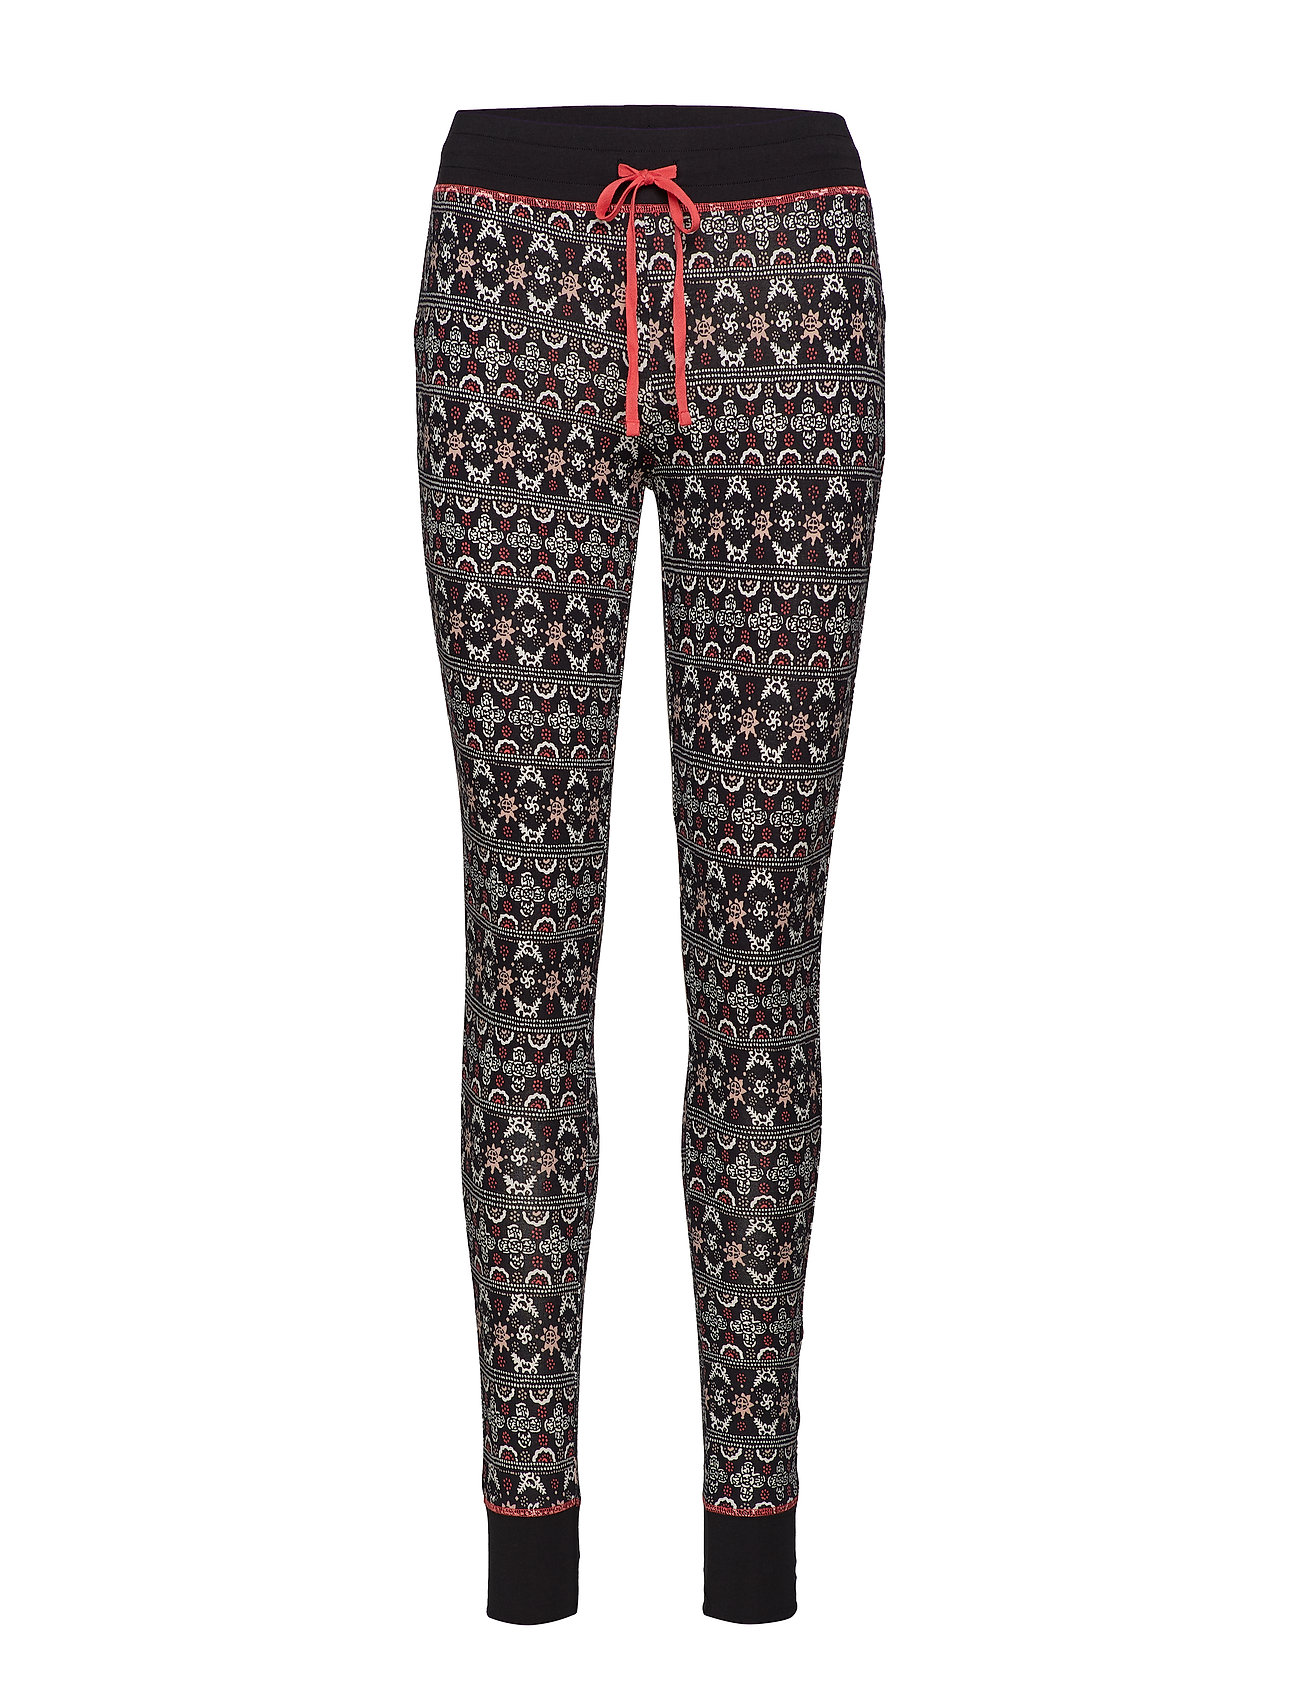 Skiny L. pyjama long - BLACK CRYSTAL